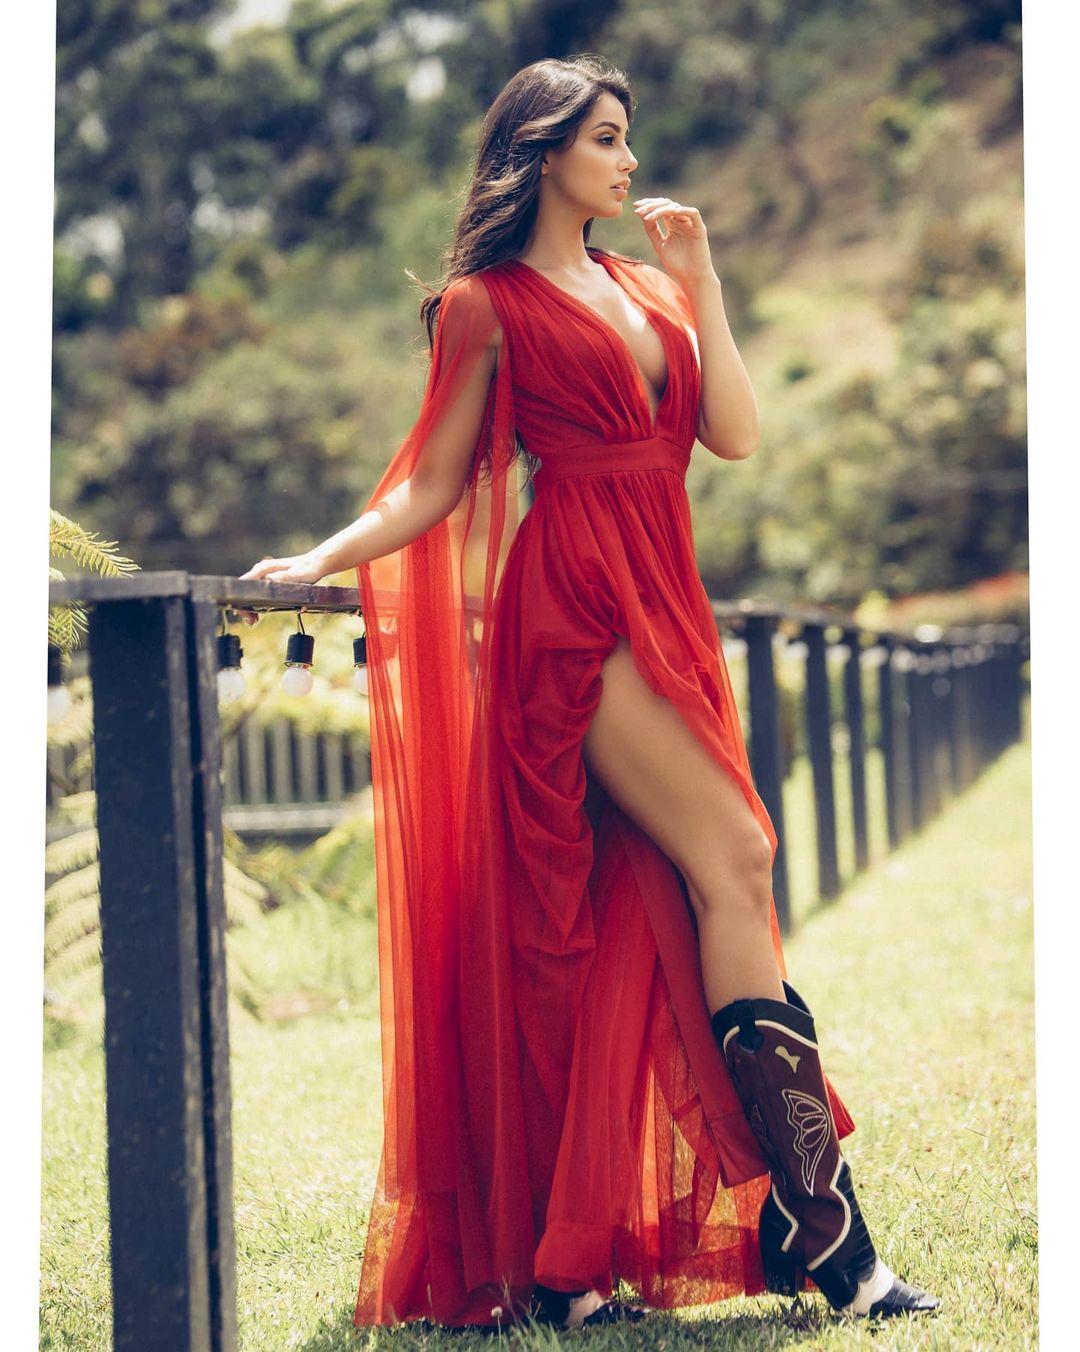 andrea aguilera, miss world colombia 2021. - Página 4 22907710